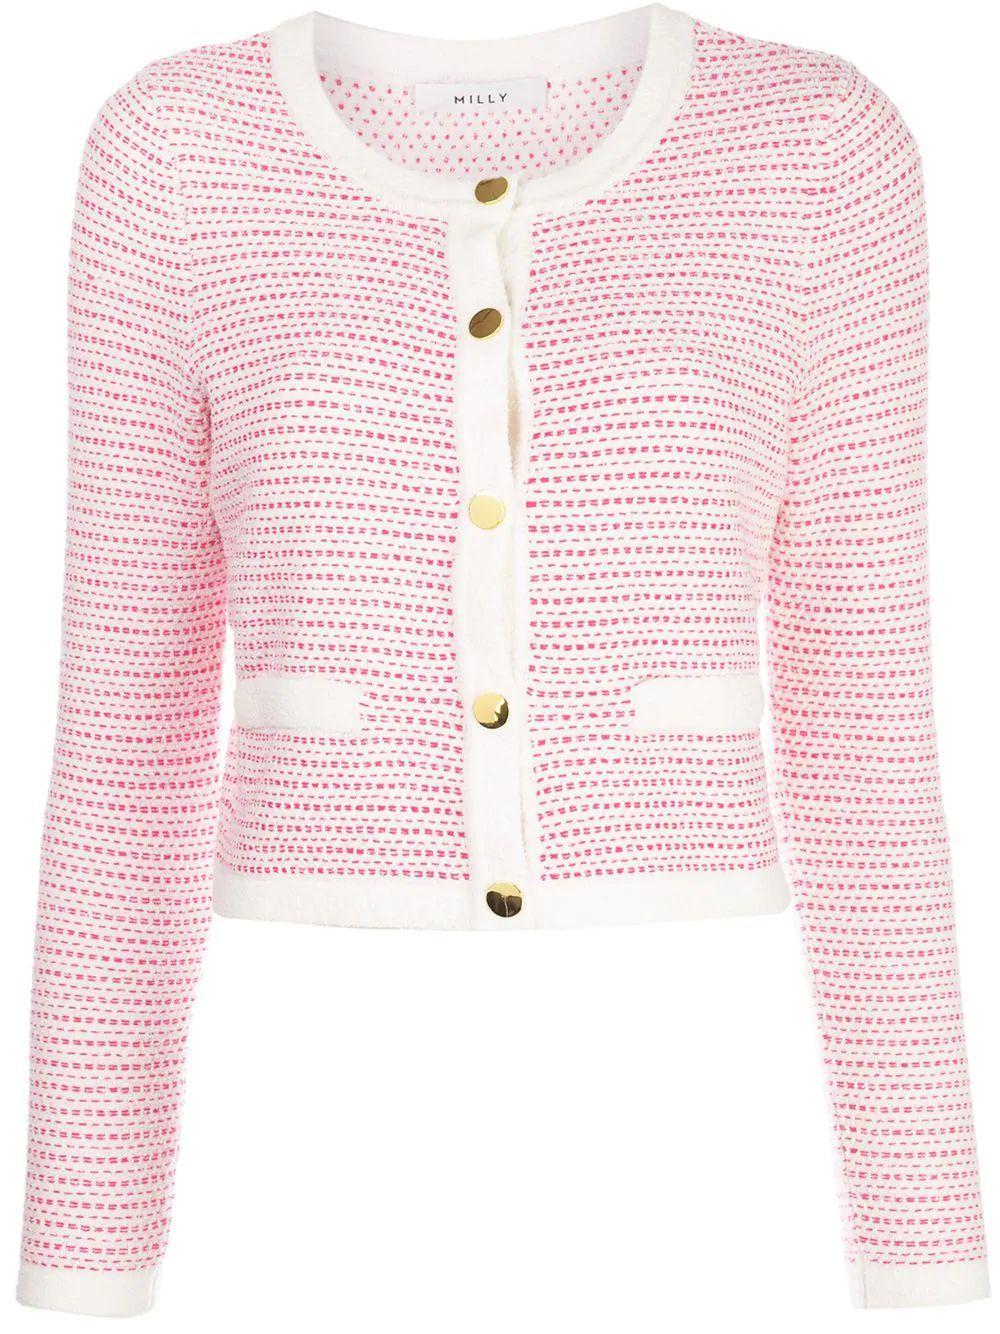 Tweed Knit Cropped Cardigan